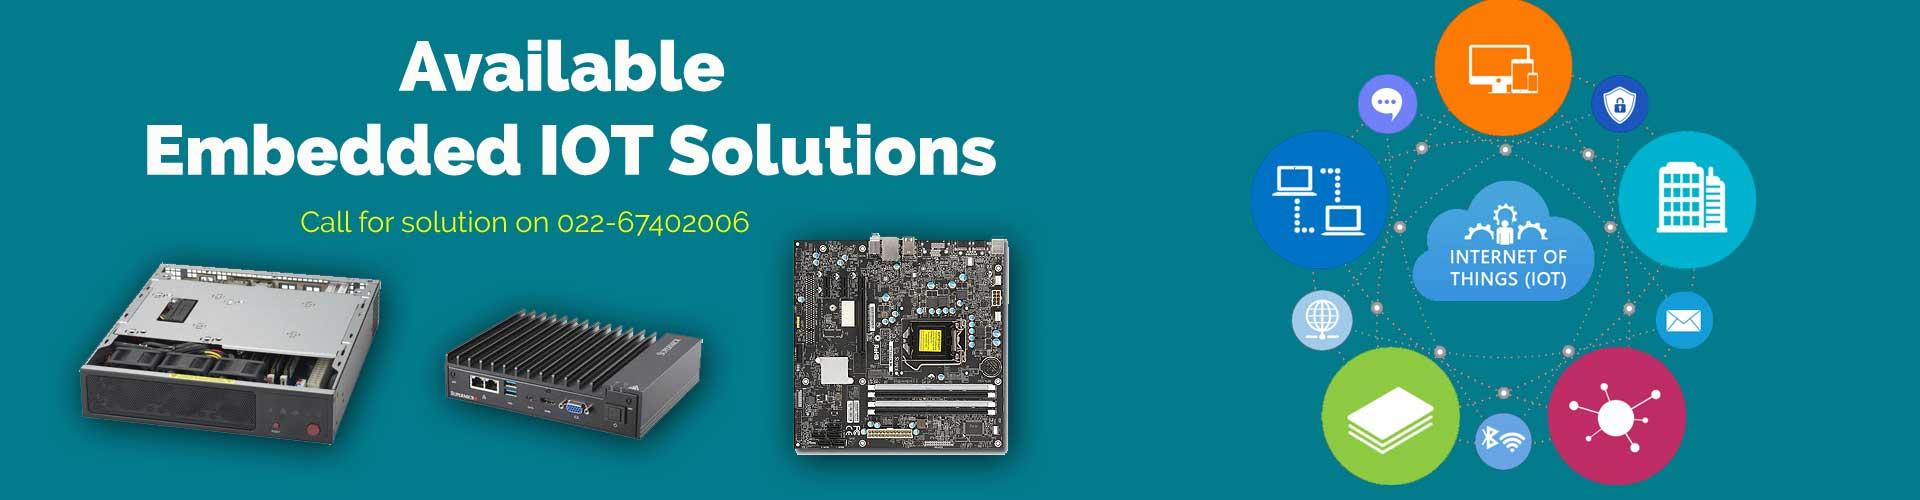 iot-solution